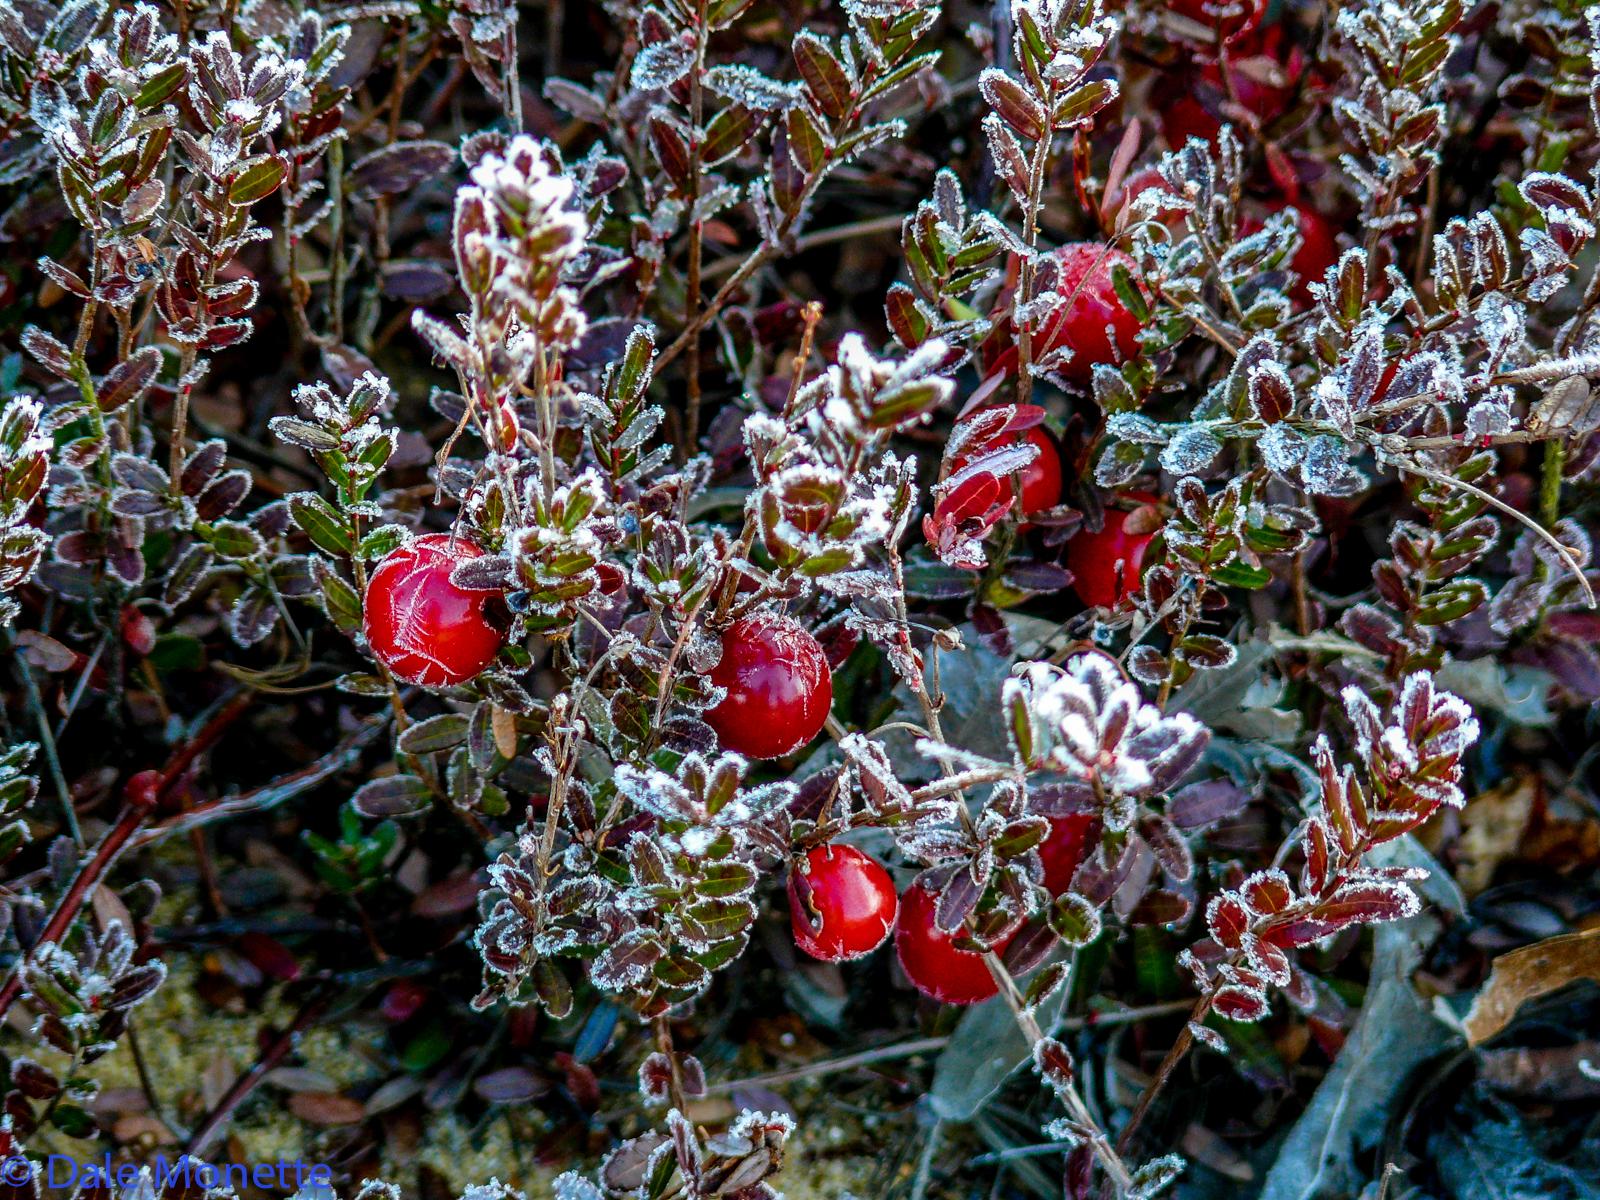 Wild cranberrys